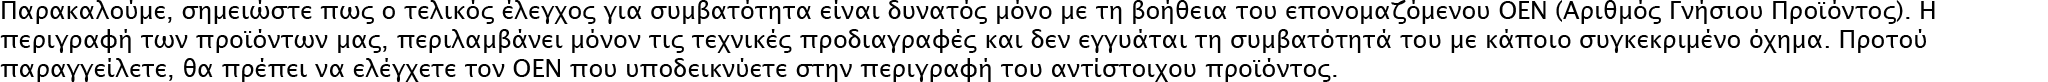 RIDEX BOC1093002059, 3707010-02, 17 01 2600F3004, 19 01 0600F6001, 3707010-01 Μπουζί